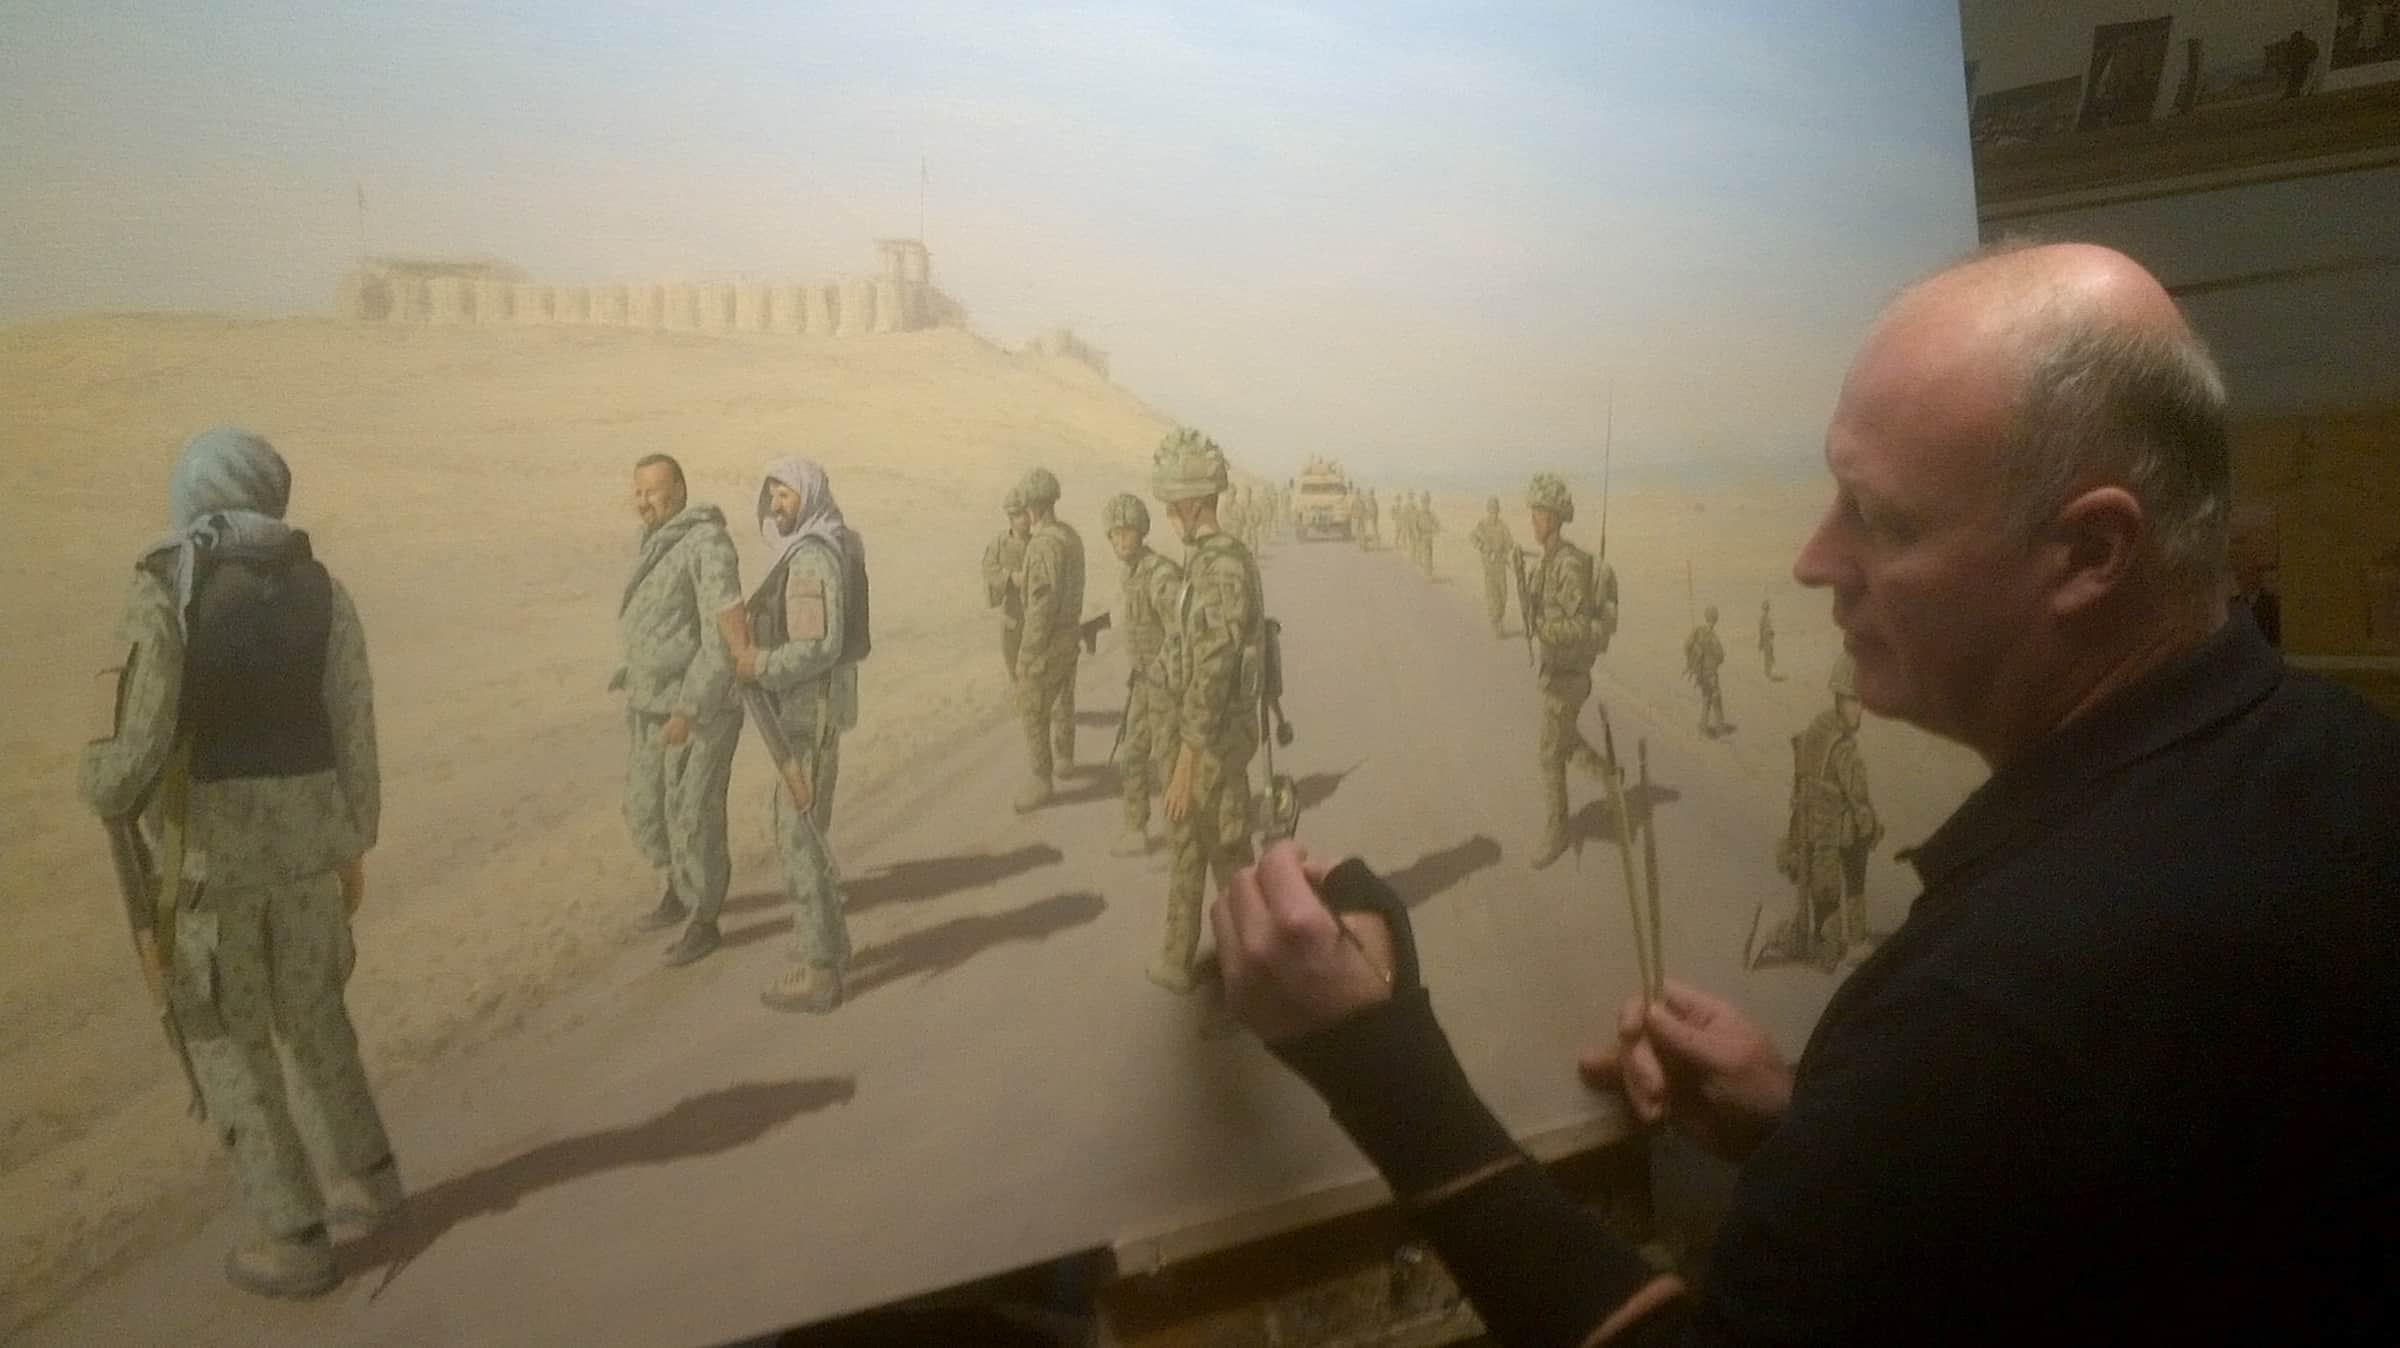 Graeme Lothian. On The 611 Helmand. Photograph courtesy of Graeme Lothian